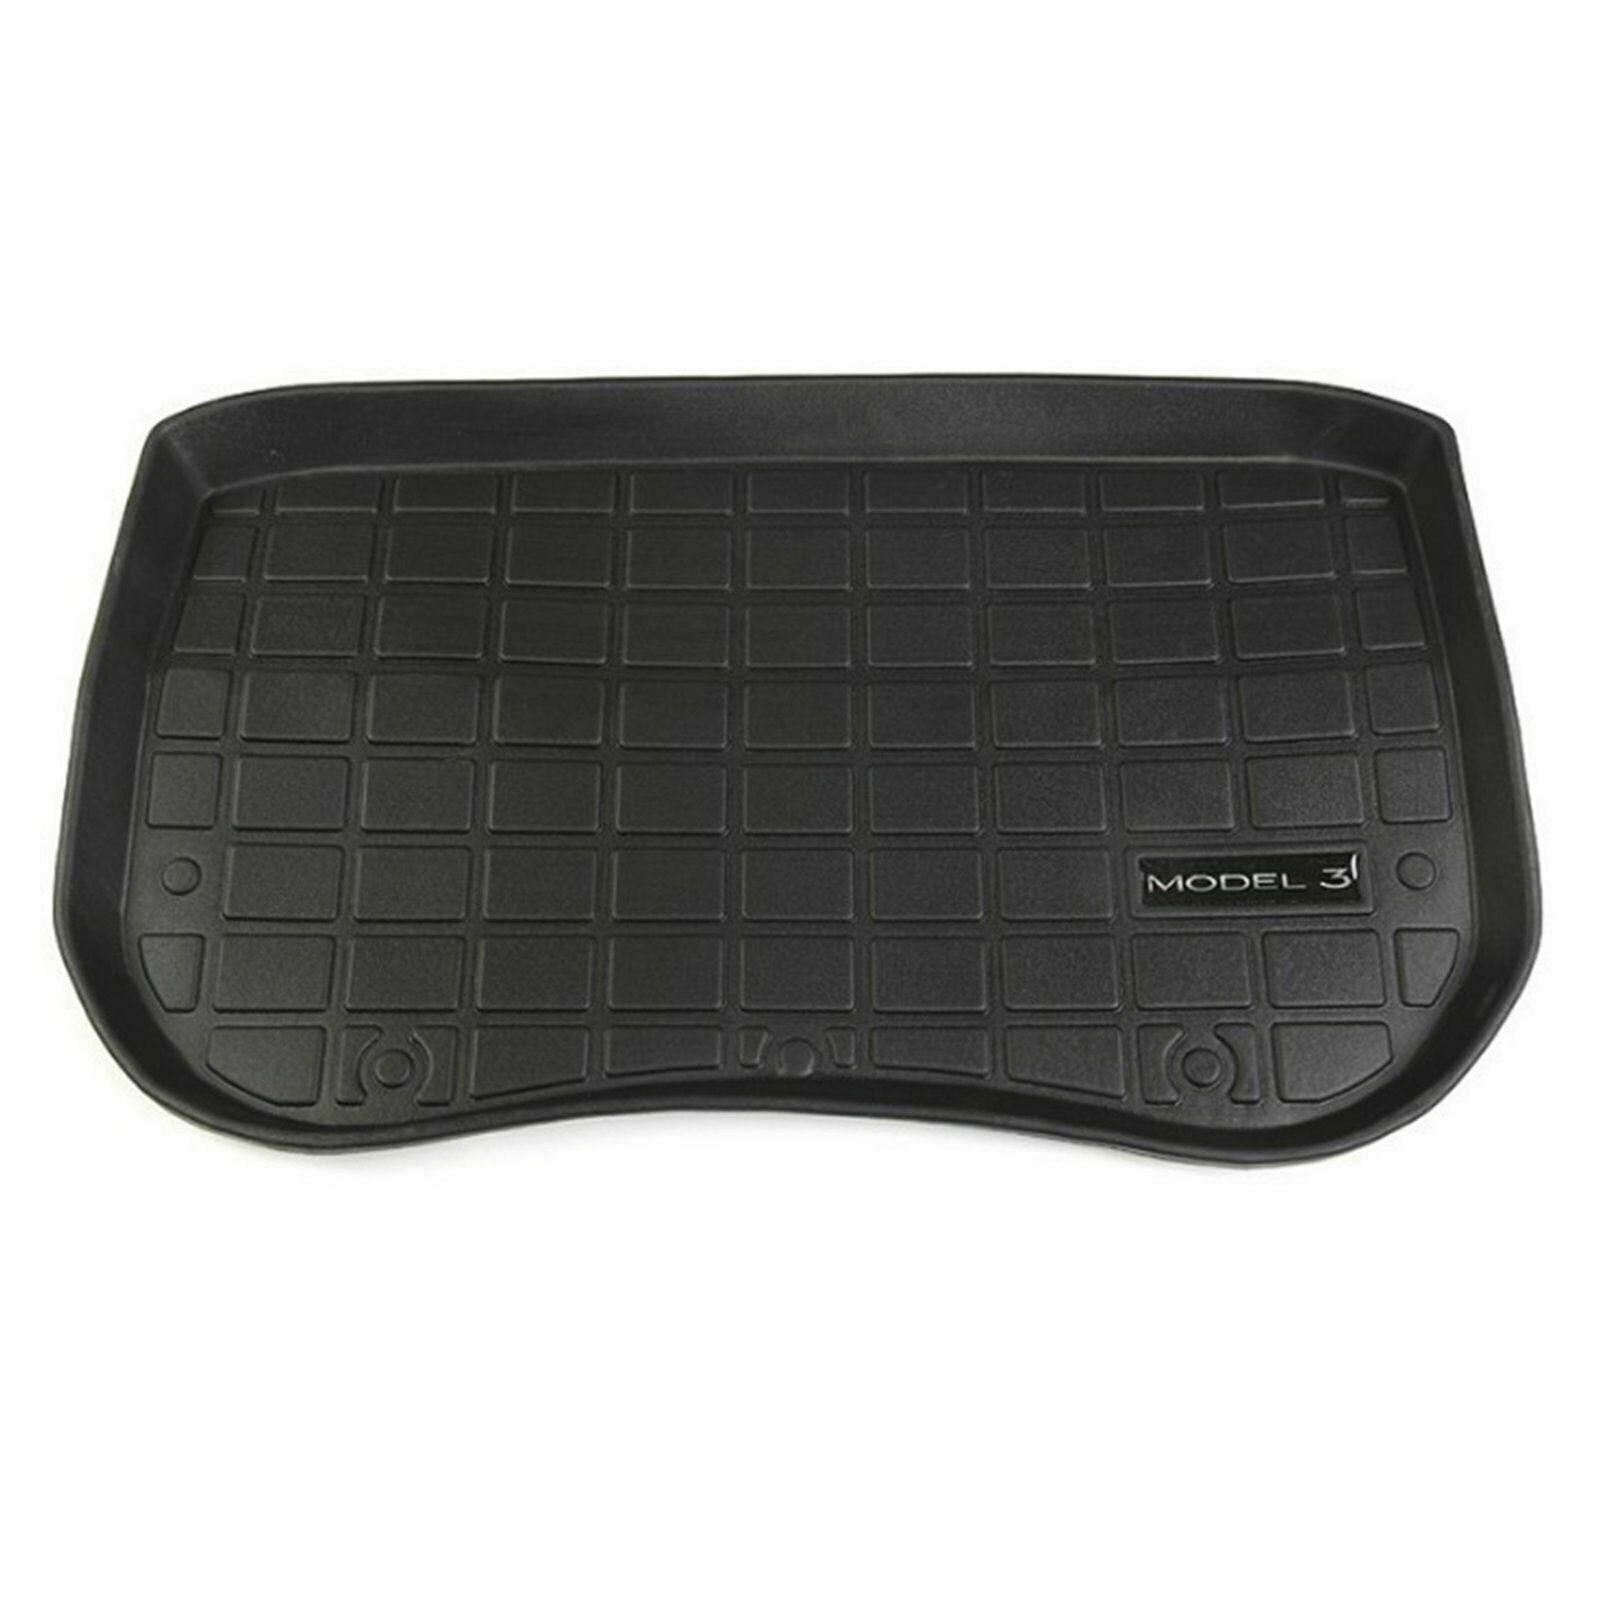 cheapest Zinc alloy Car Remote Key Case Cove  For BMW 520 525 f11 f30 f31 f10 F18 f48 118i 320i 1 2 3 4 5  7 Series  X3 X4 X5 X6 M3 M4 M5